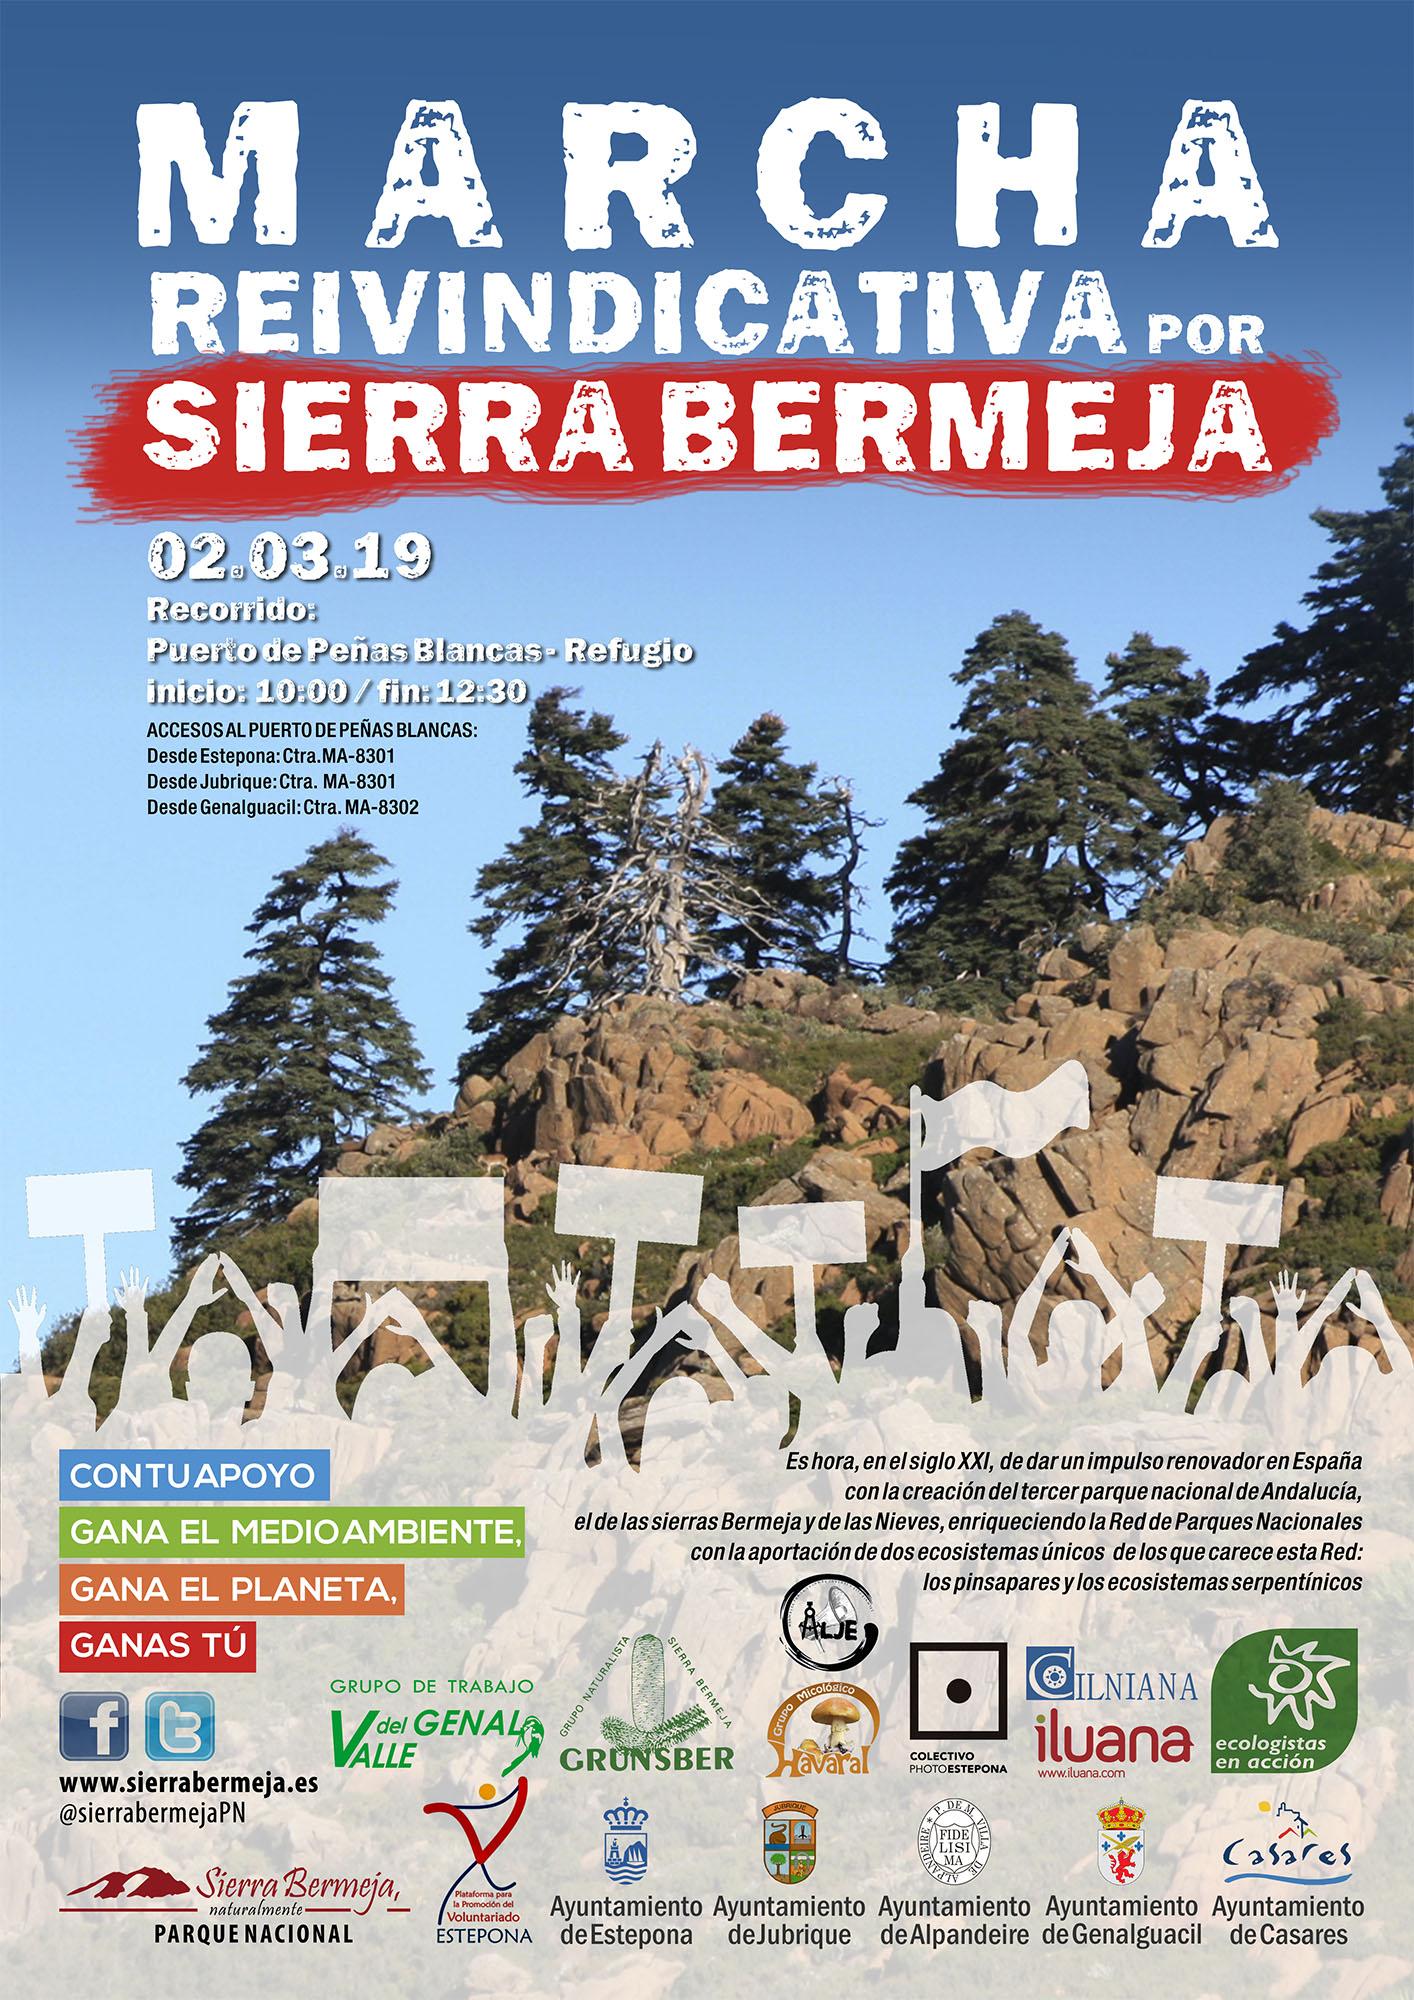 Marcha reivindicativa por Sierra Bermeja